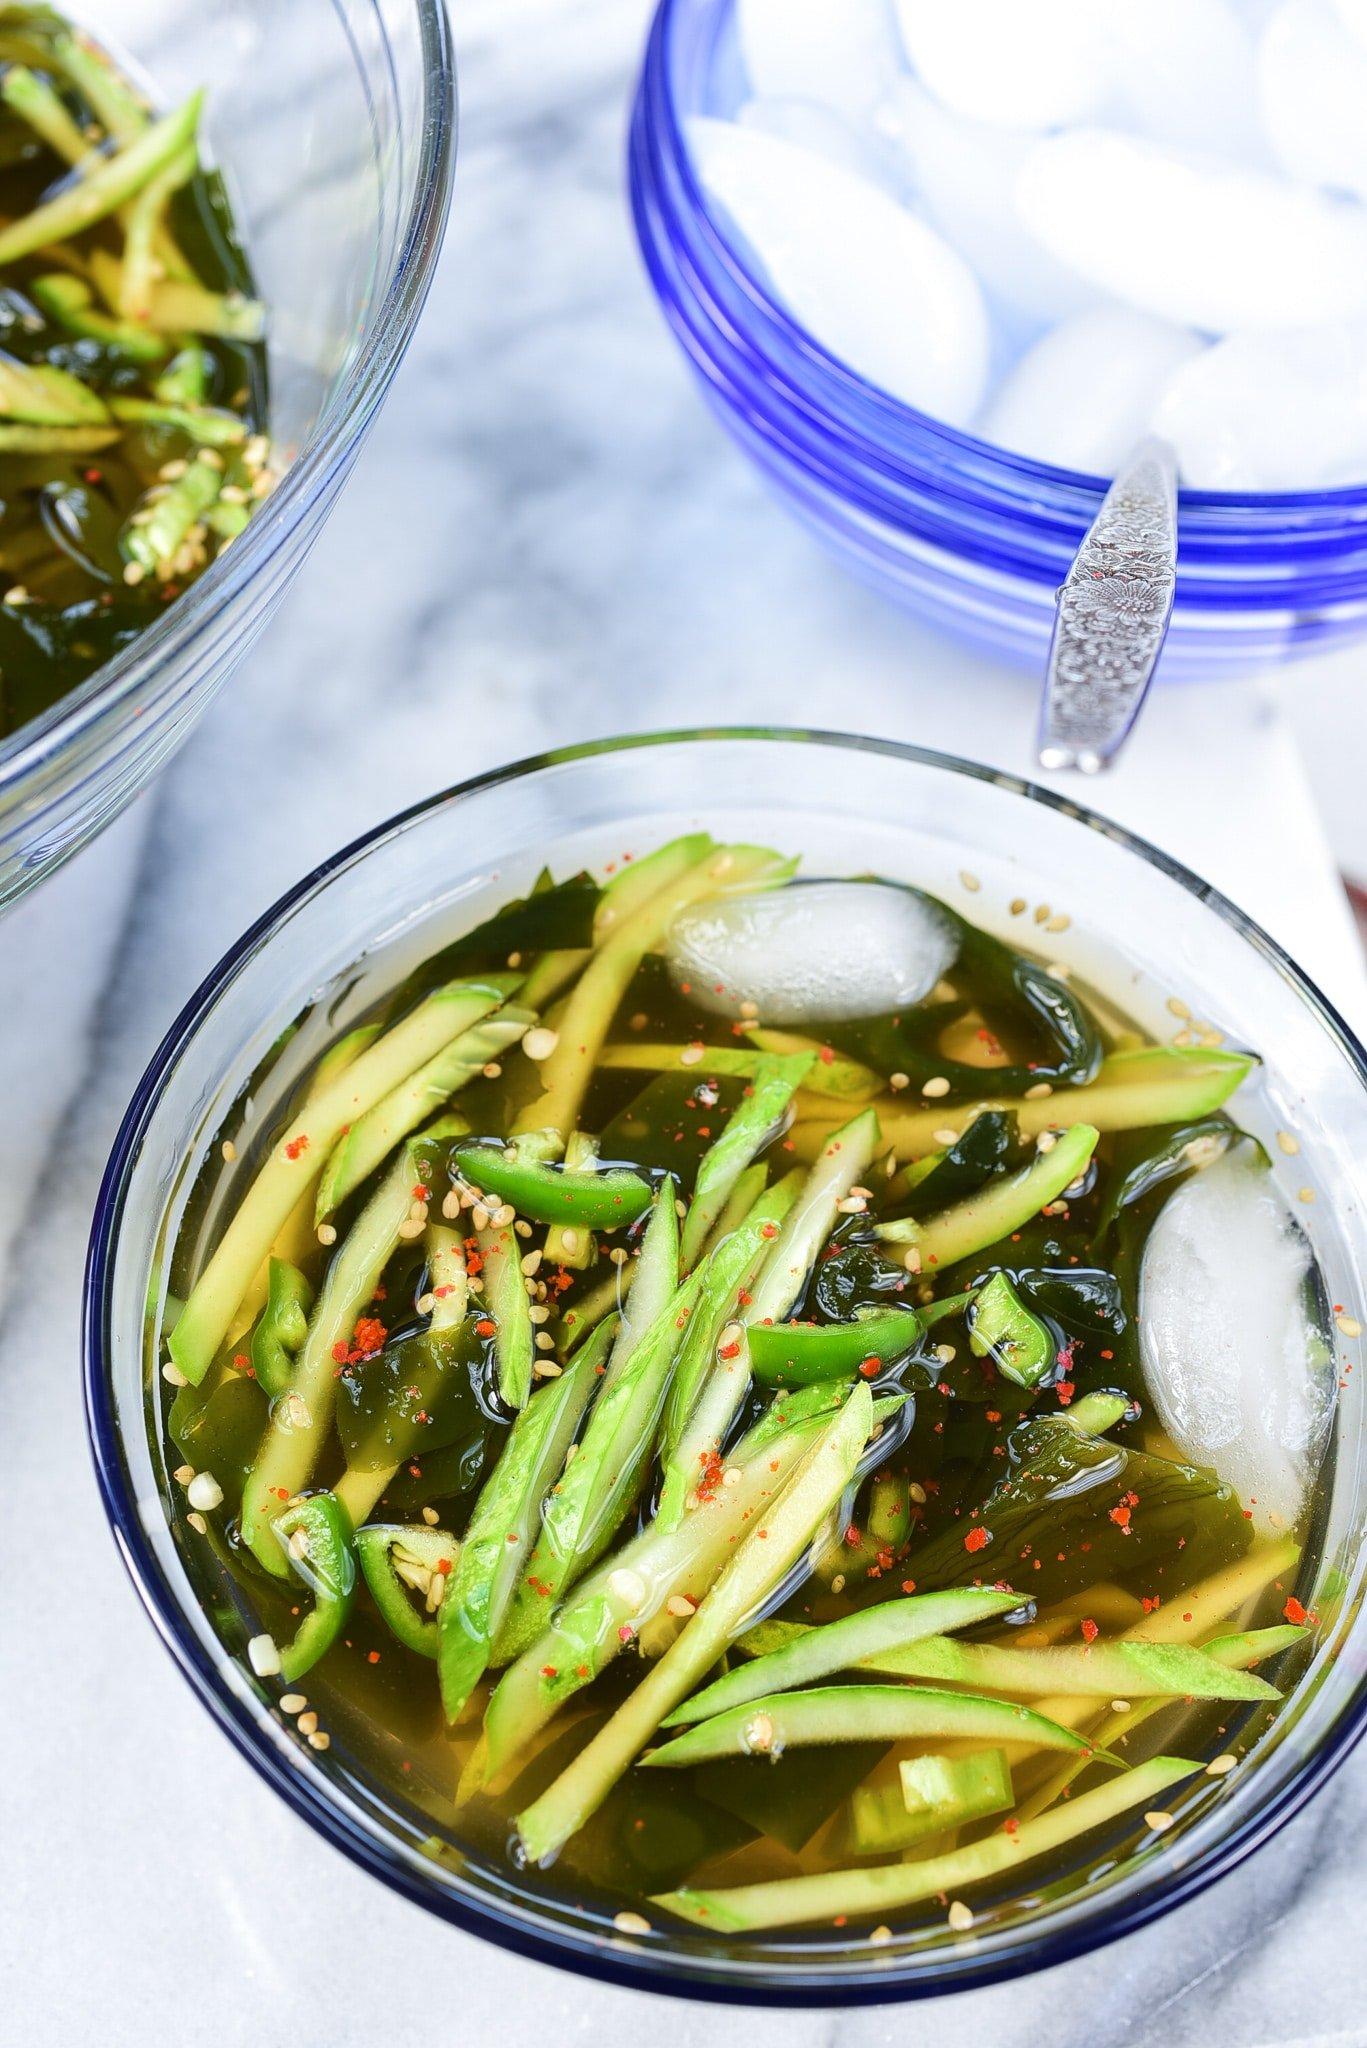 DSC 4953 2 - Oi Naengguk (Chilled Cucumber Soup)